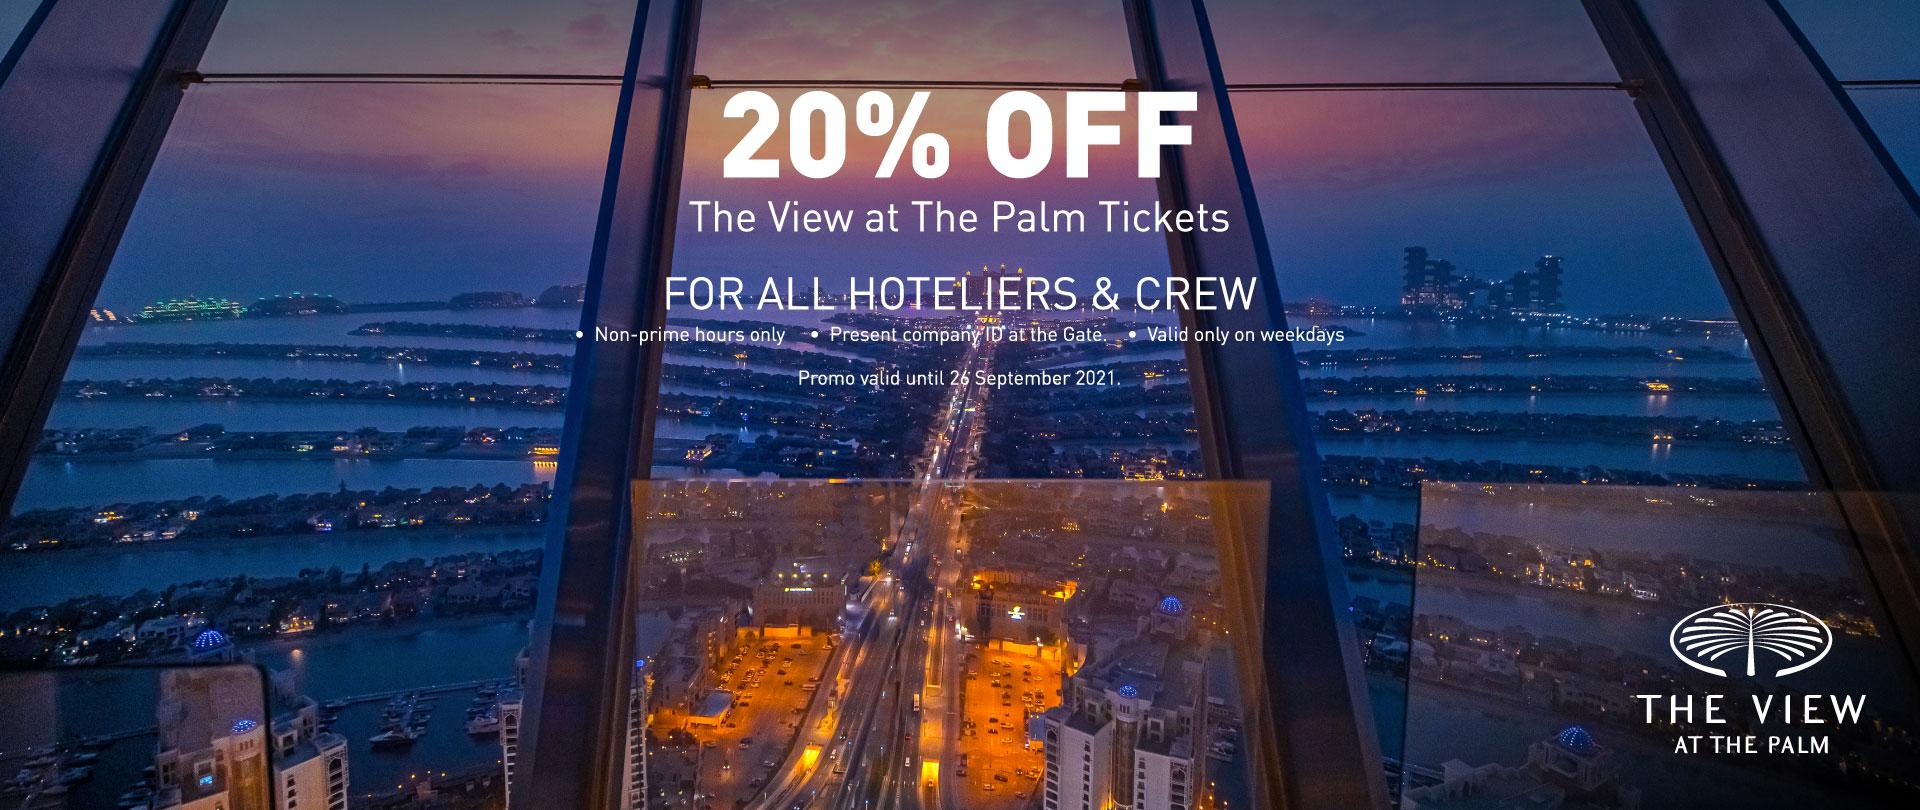 Hoteliers & Airline Crew: